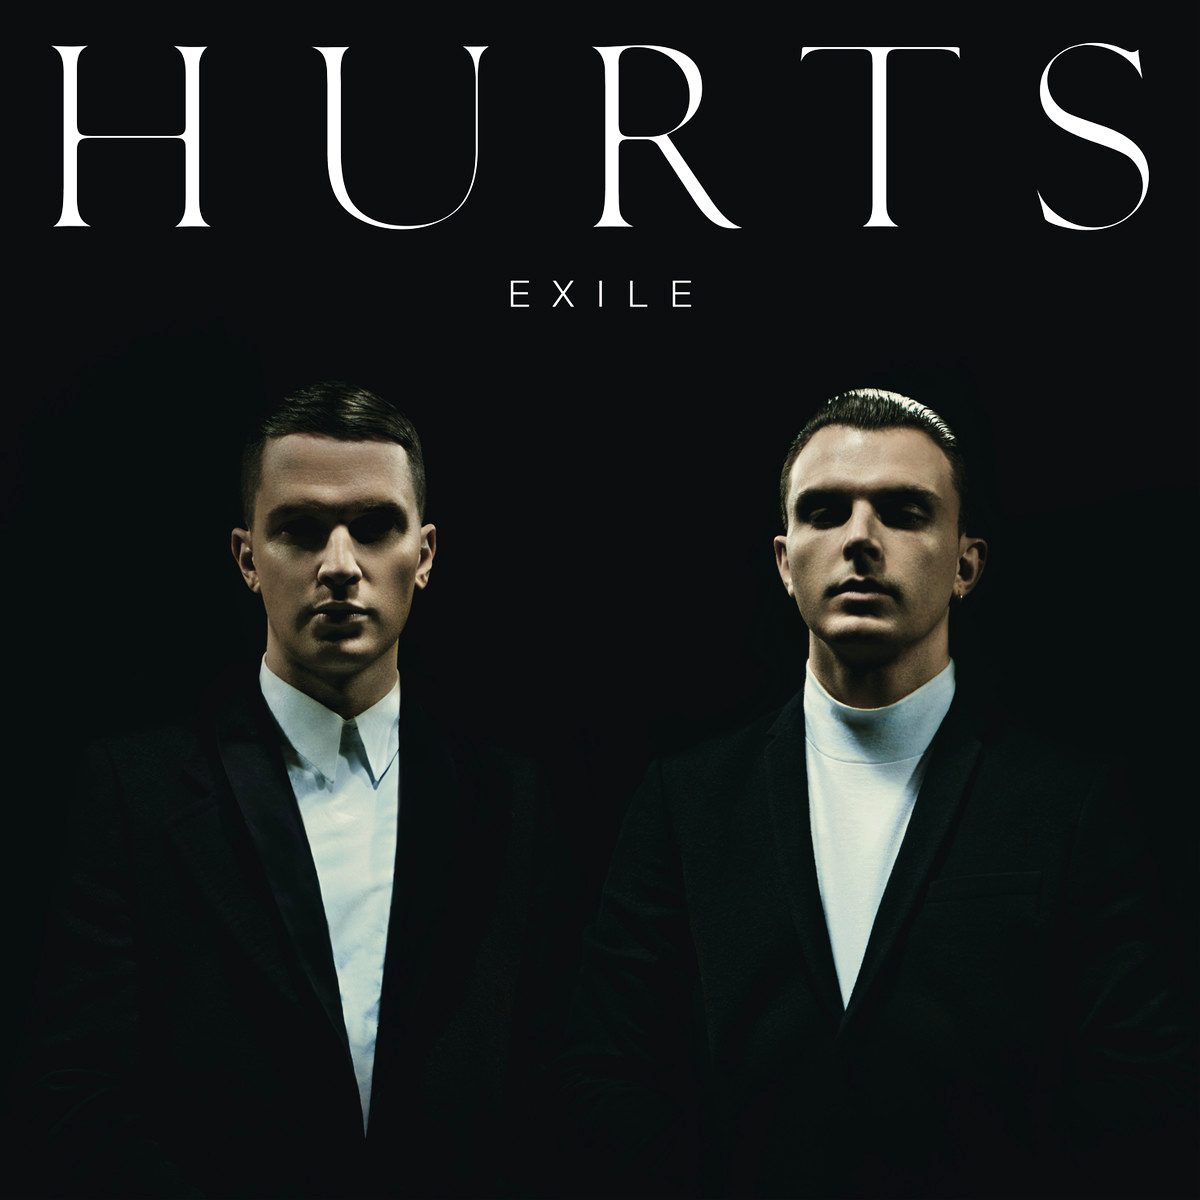 【Hurts  音乐专辑】 - 欢喜 - 南 风 园  Music